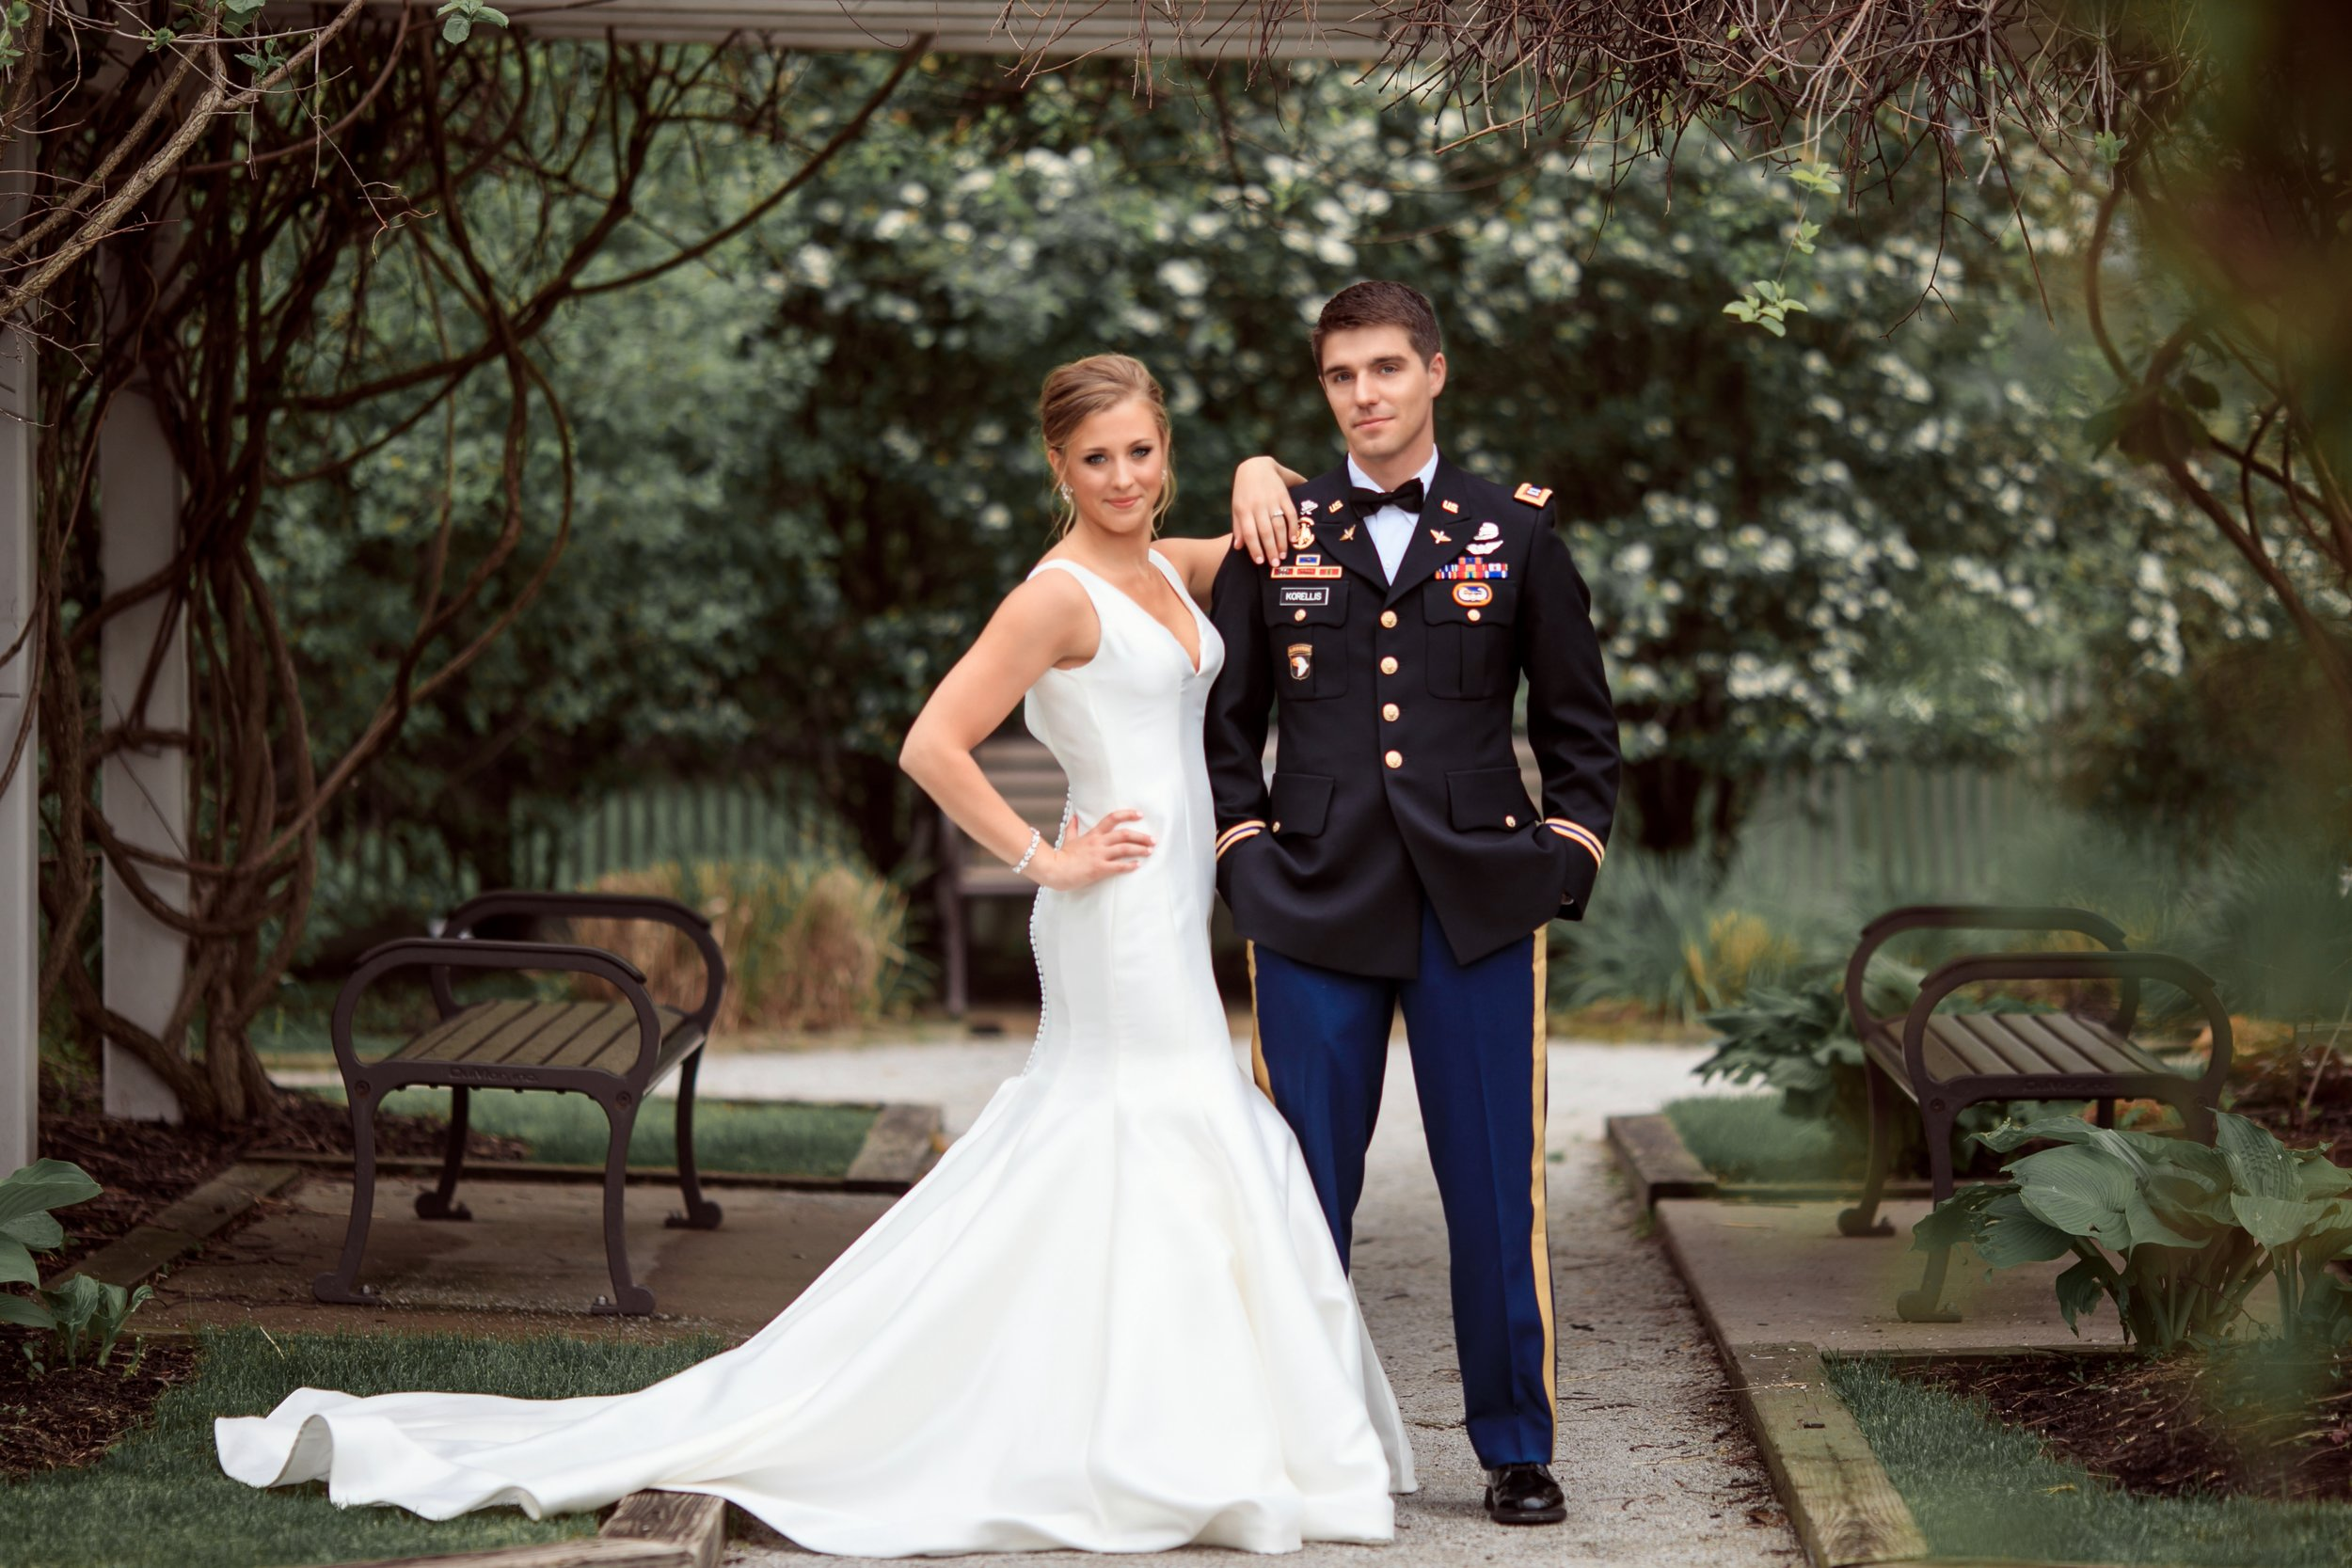 Centennial-Park-Munster-indiana-bride-and-groom.jpg